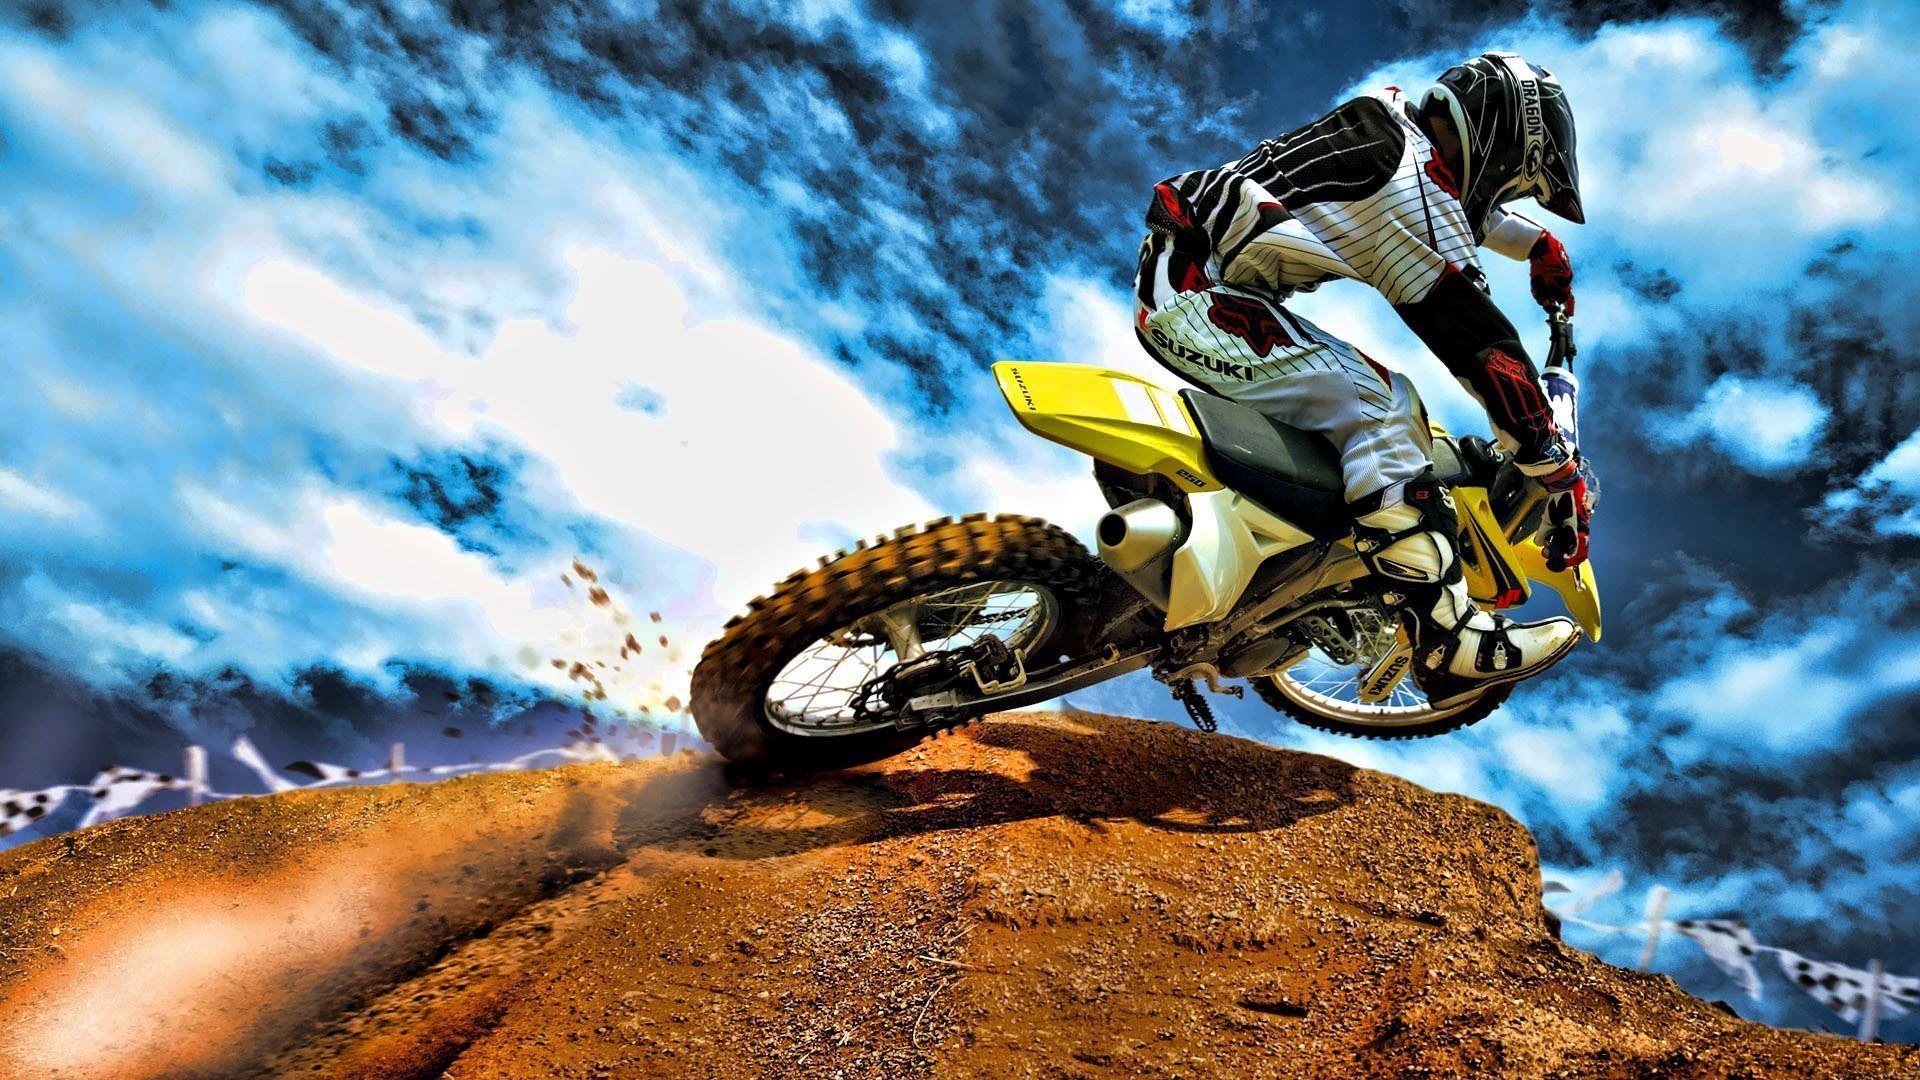 Dirt Bike Wallpaper HD 1080 2014 Edition dirt bike